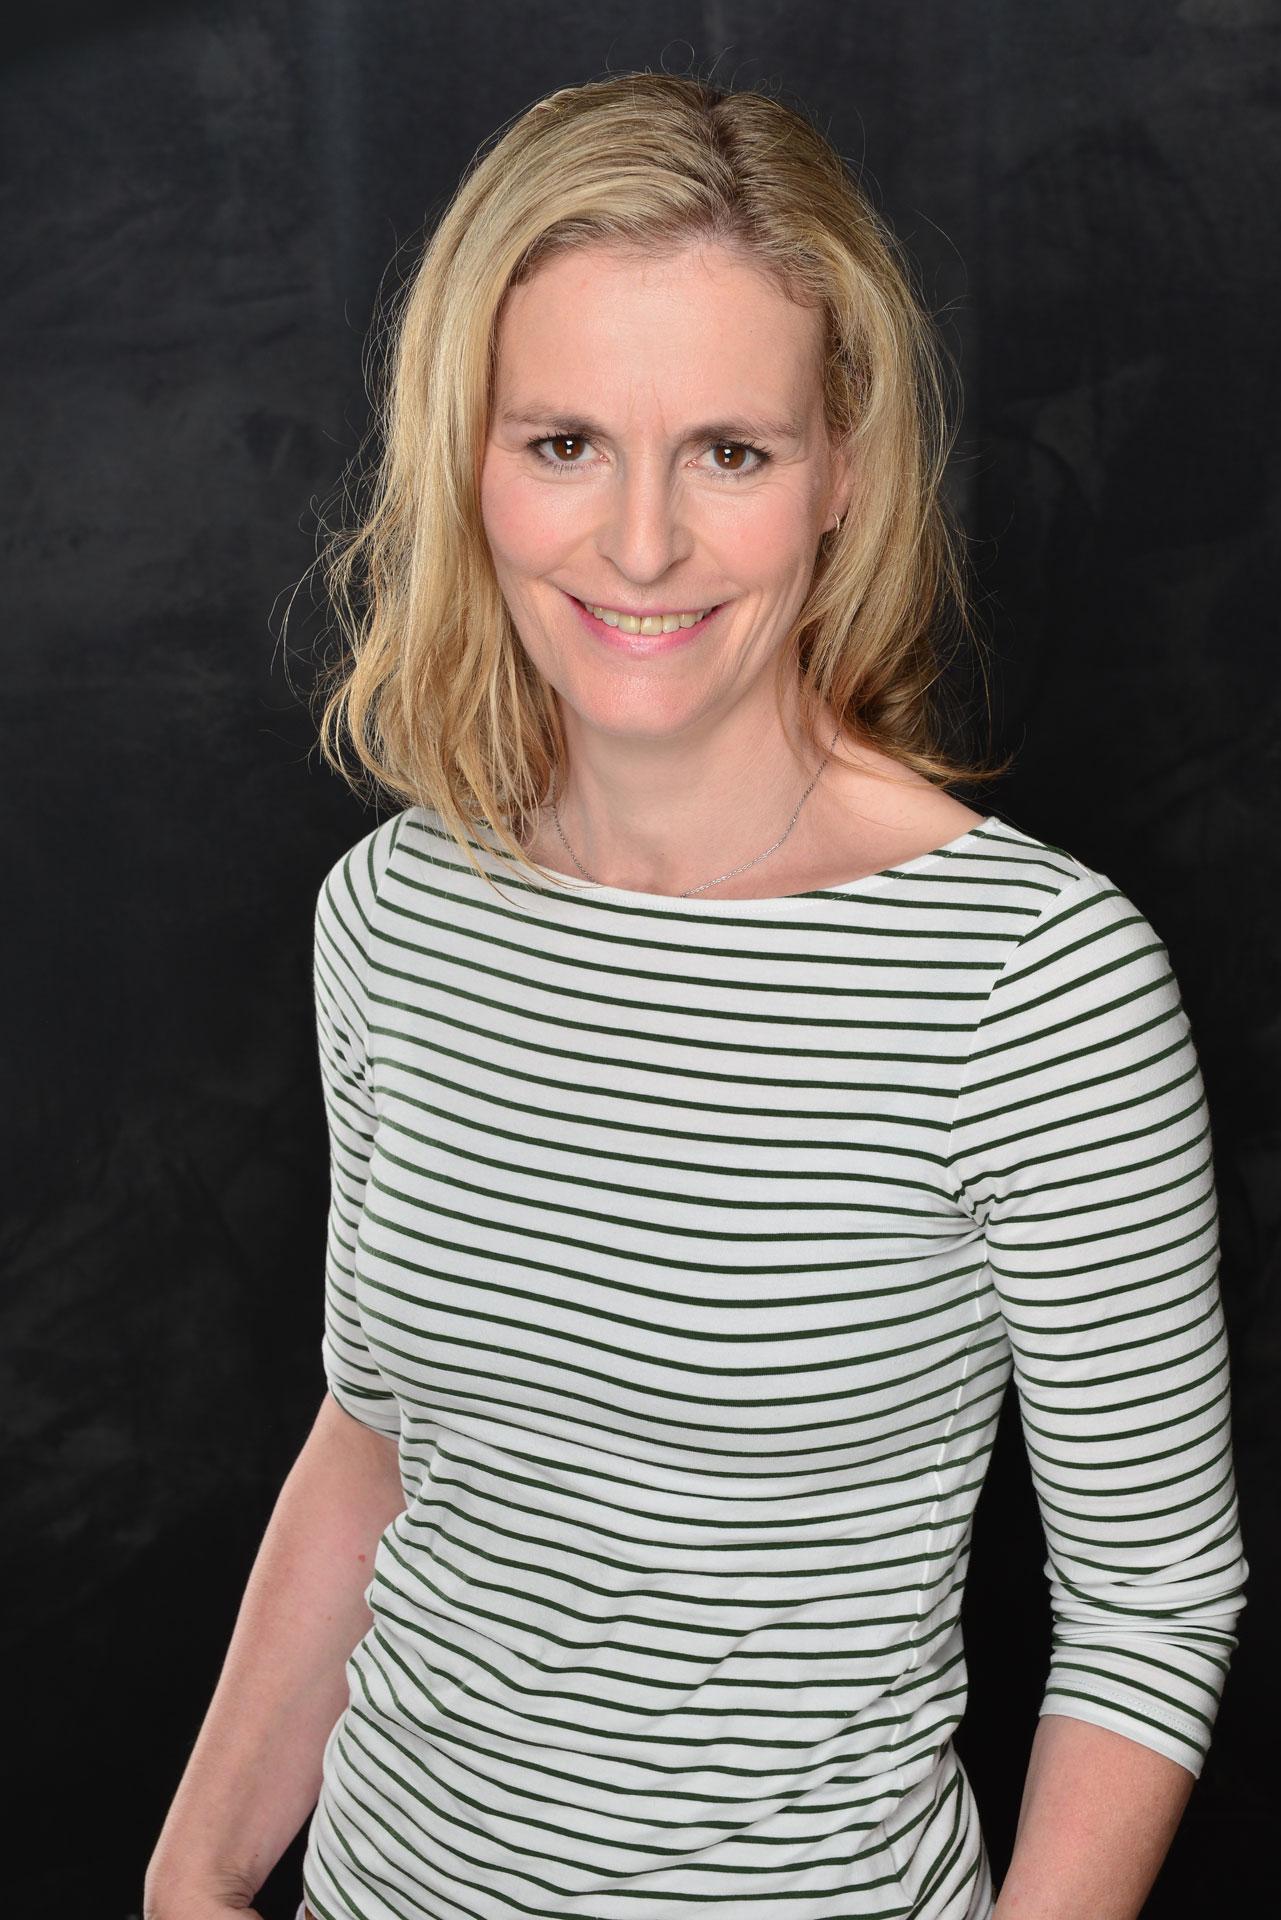 Stefanie Schlichting Physiotherapeutin Osteopathin BSc Kinderosteopathin